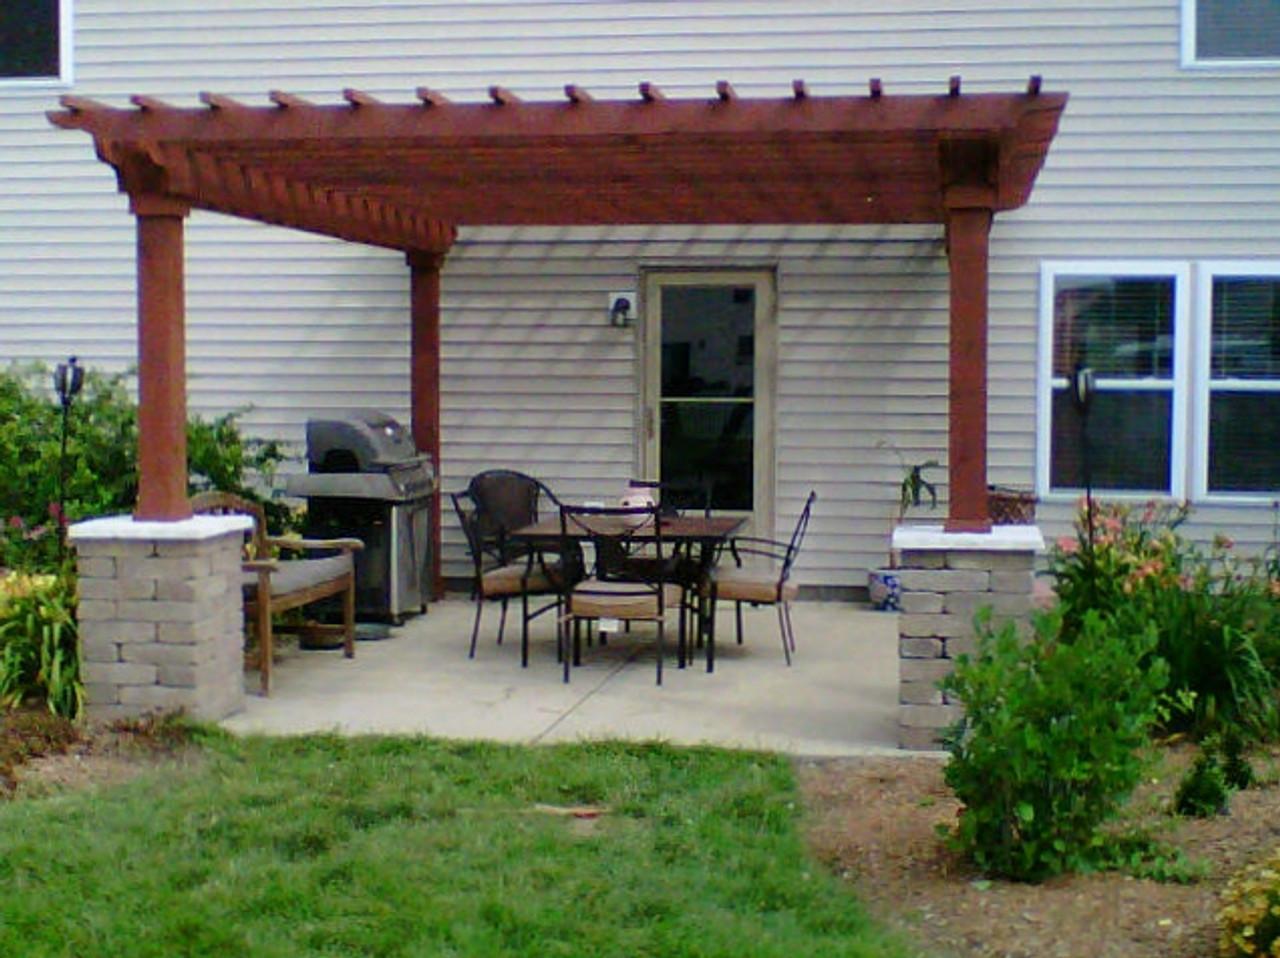 Eastern Pine pergola kit in backyard - 10 X 12 DIY Pergola Kit.